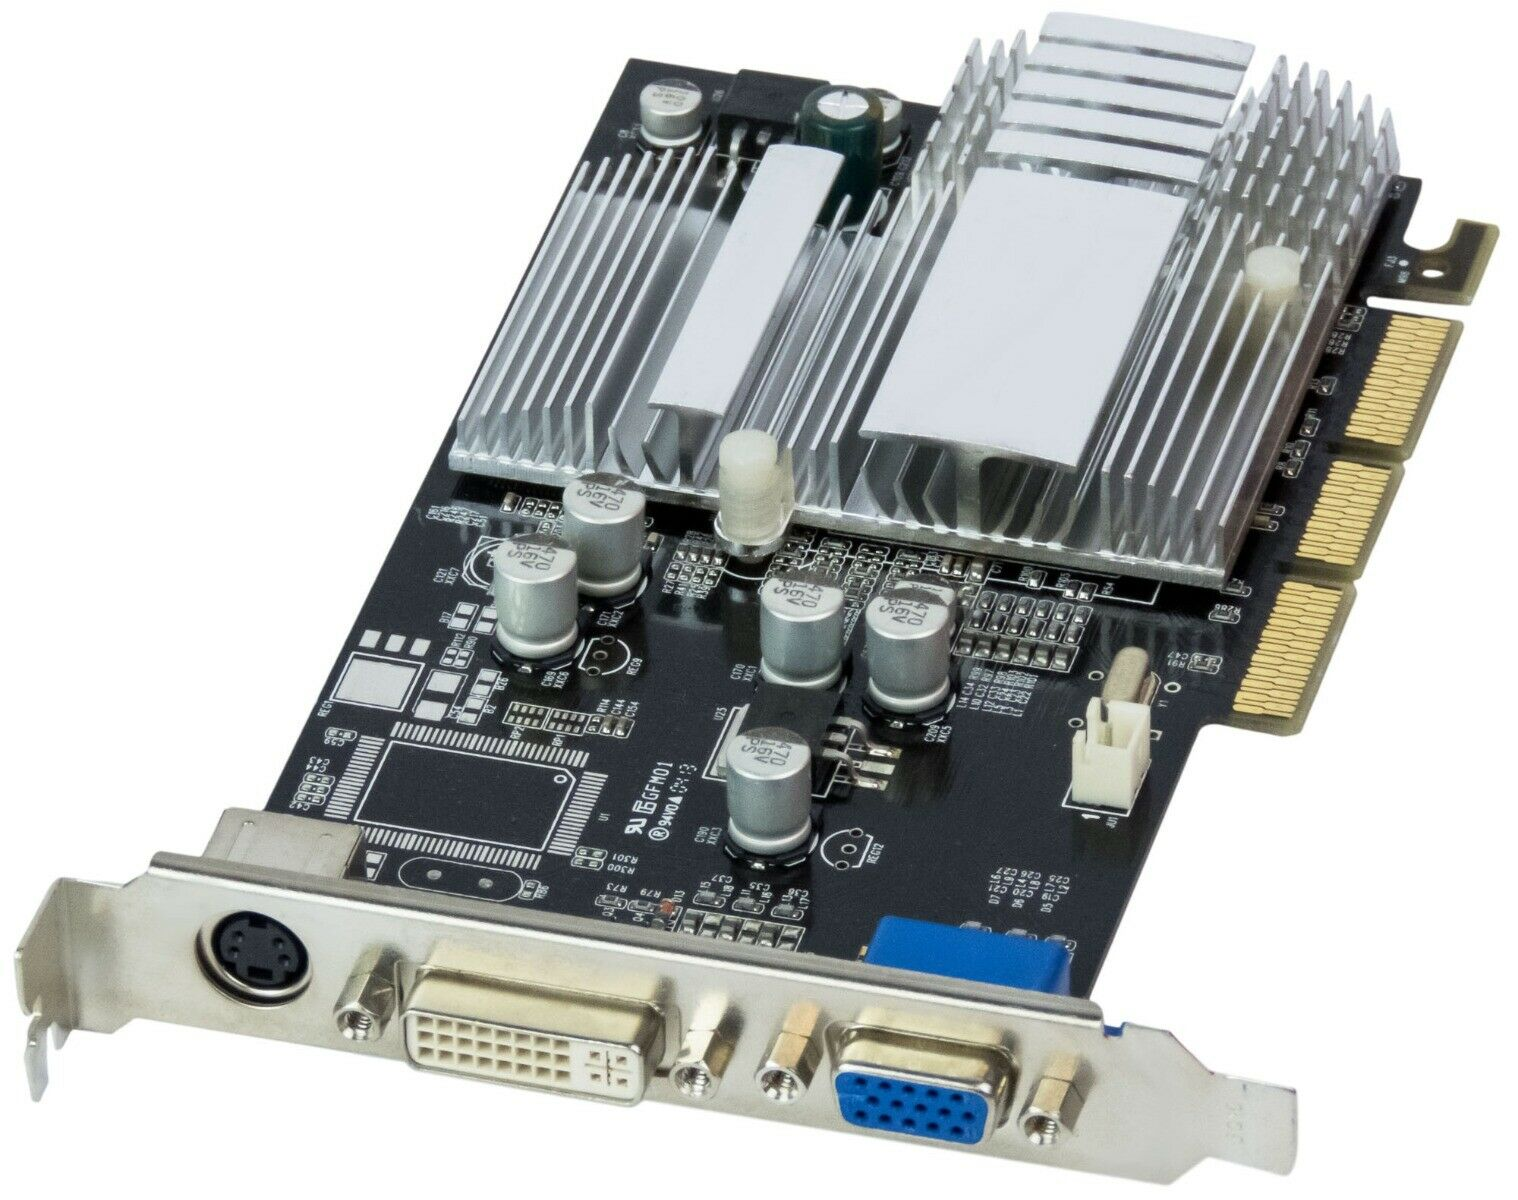 ATI RADEON 9200 SE 128MB R9200SE AGP